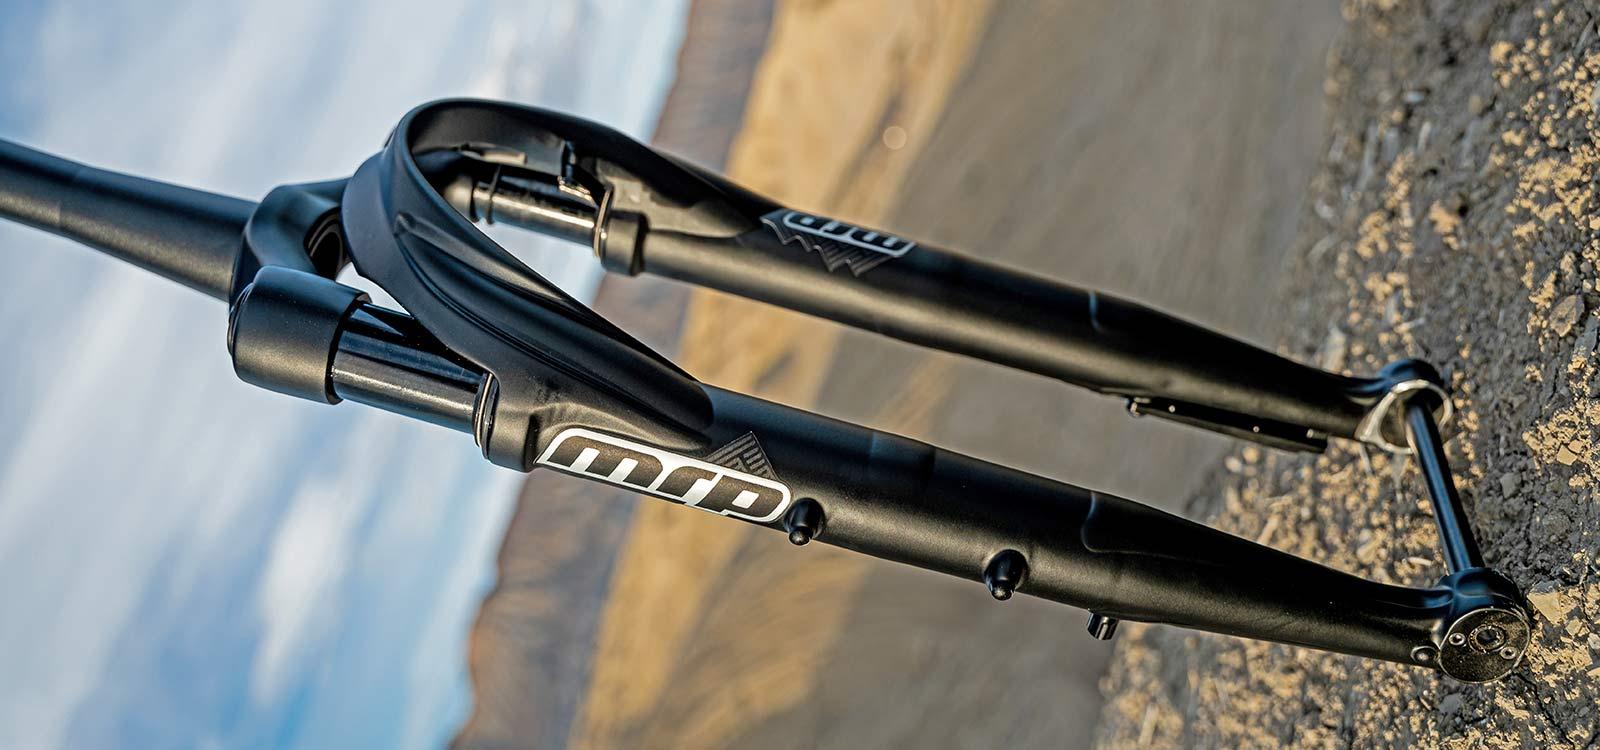 All-new MRP Baxter gravel fork, lightweight 40mm 60mm gravel bike-specific suspension,angled